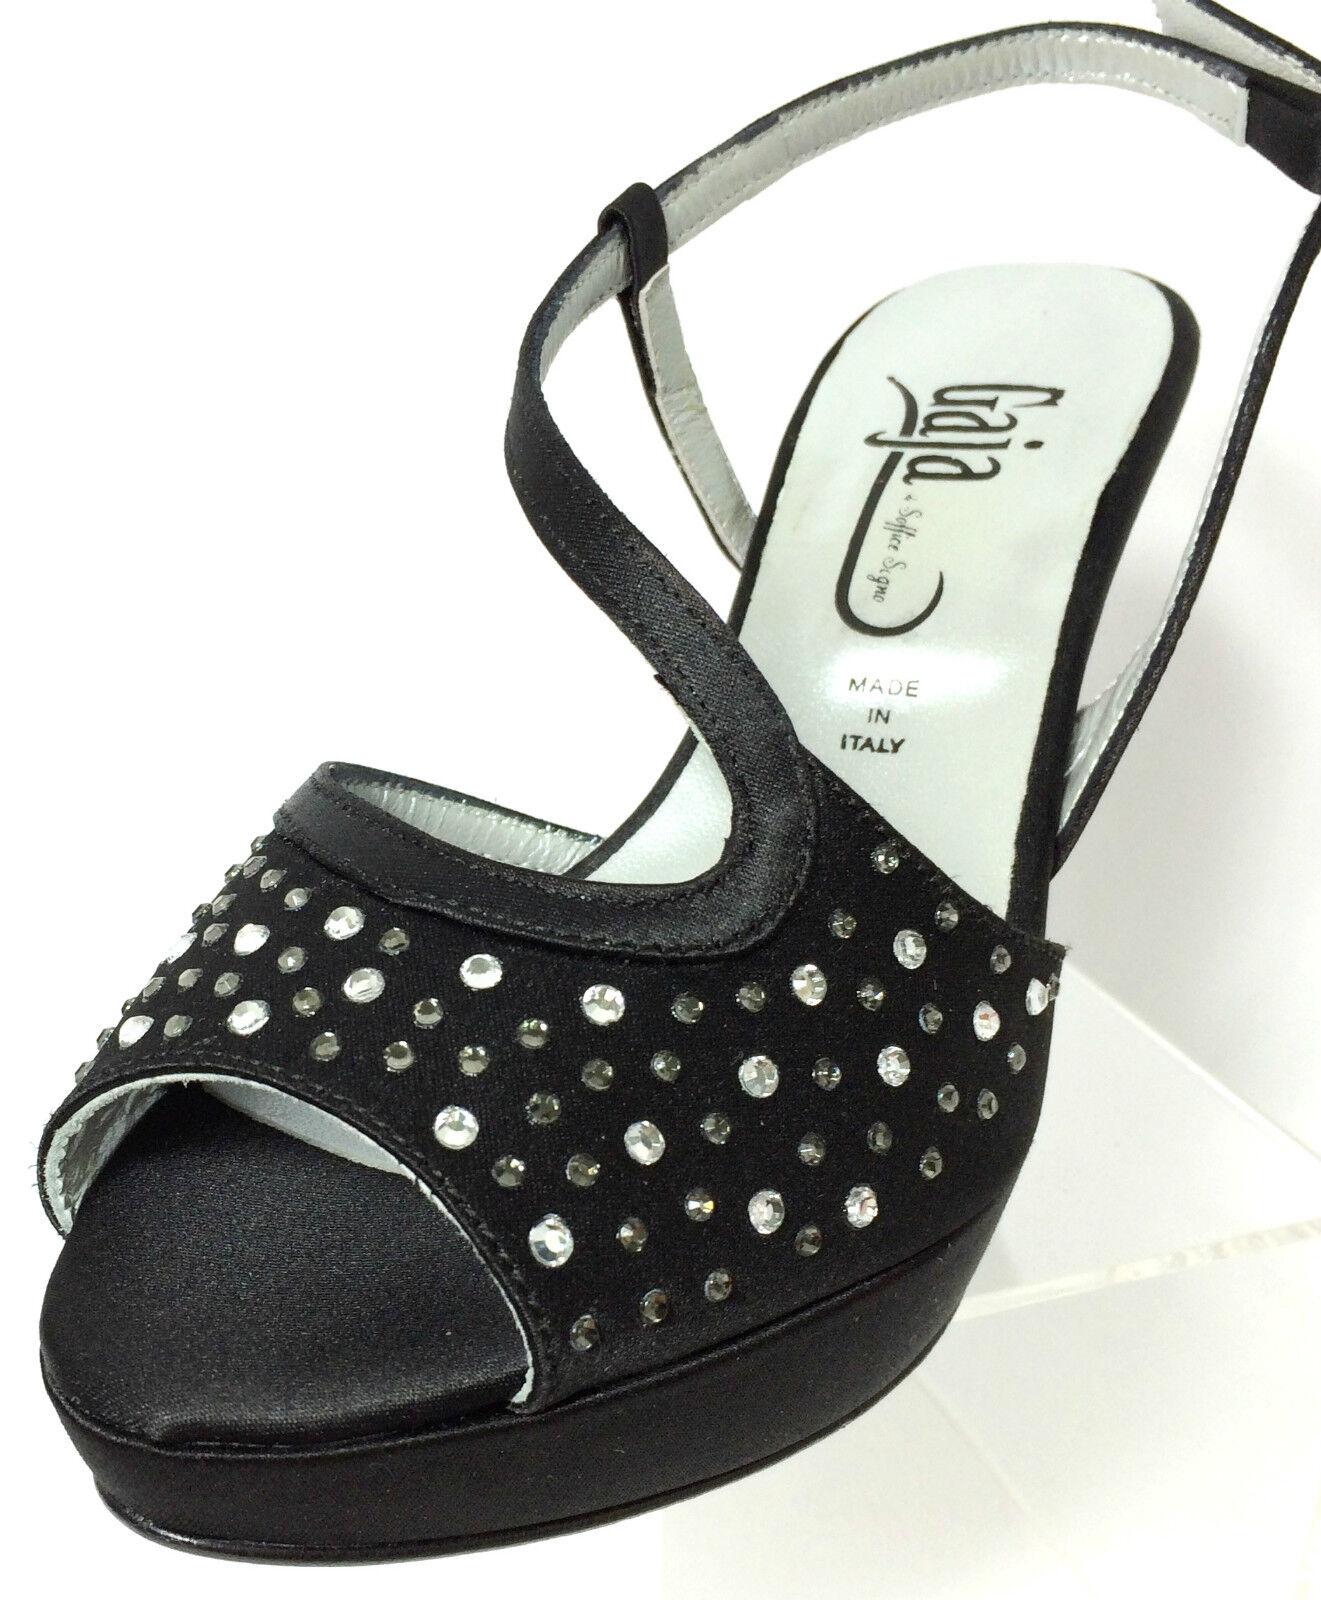 SOFFICE SOGNO chaussures COMODE femmes SANDALI RASO IN SETA CouleurE noir TACCO H 7 CM